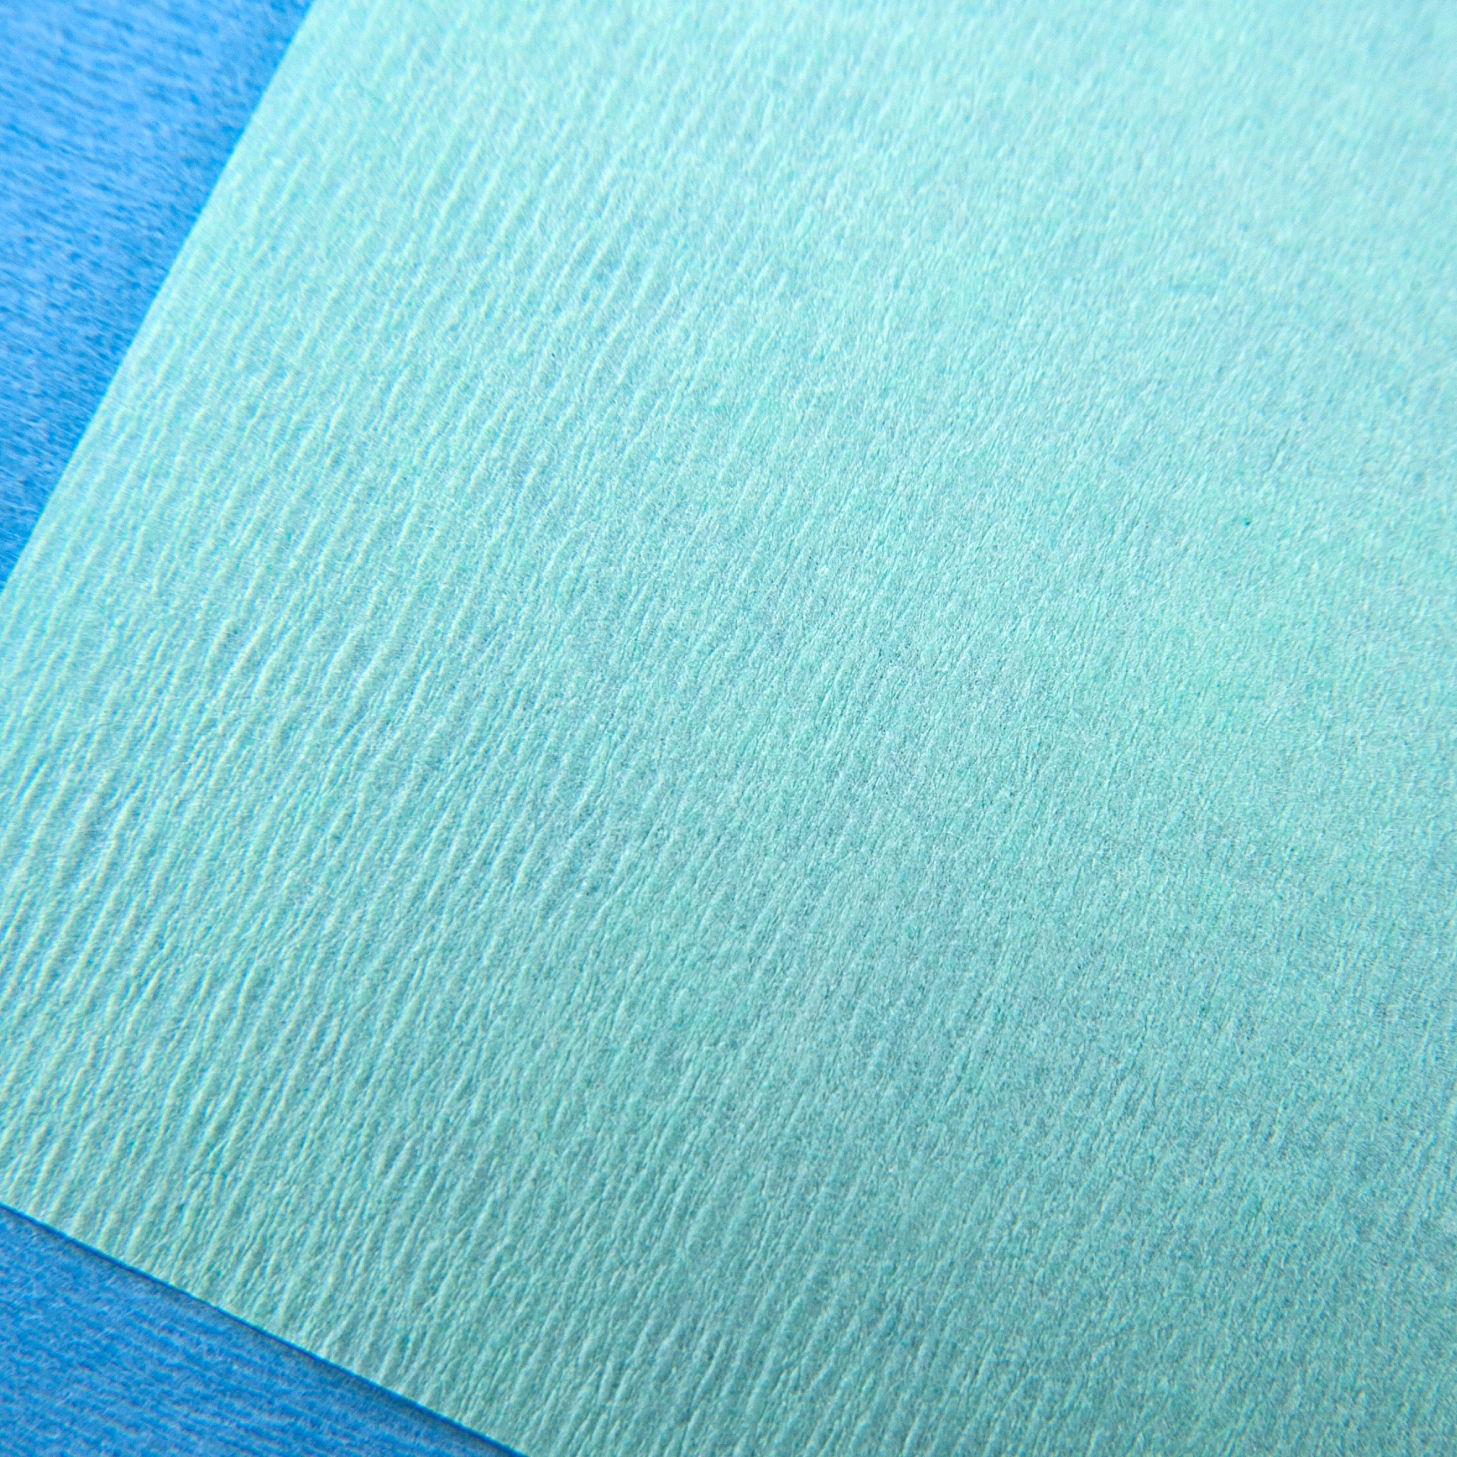 Медицинская гофрированная бумага/медицинская упаковка Водонепроницаемая крепированная бумага для хирургического назначения